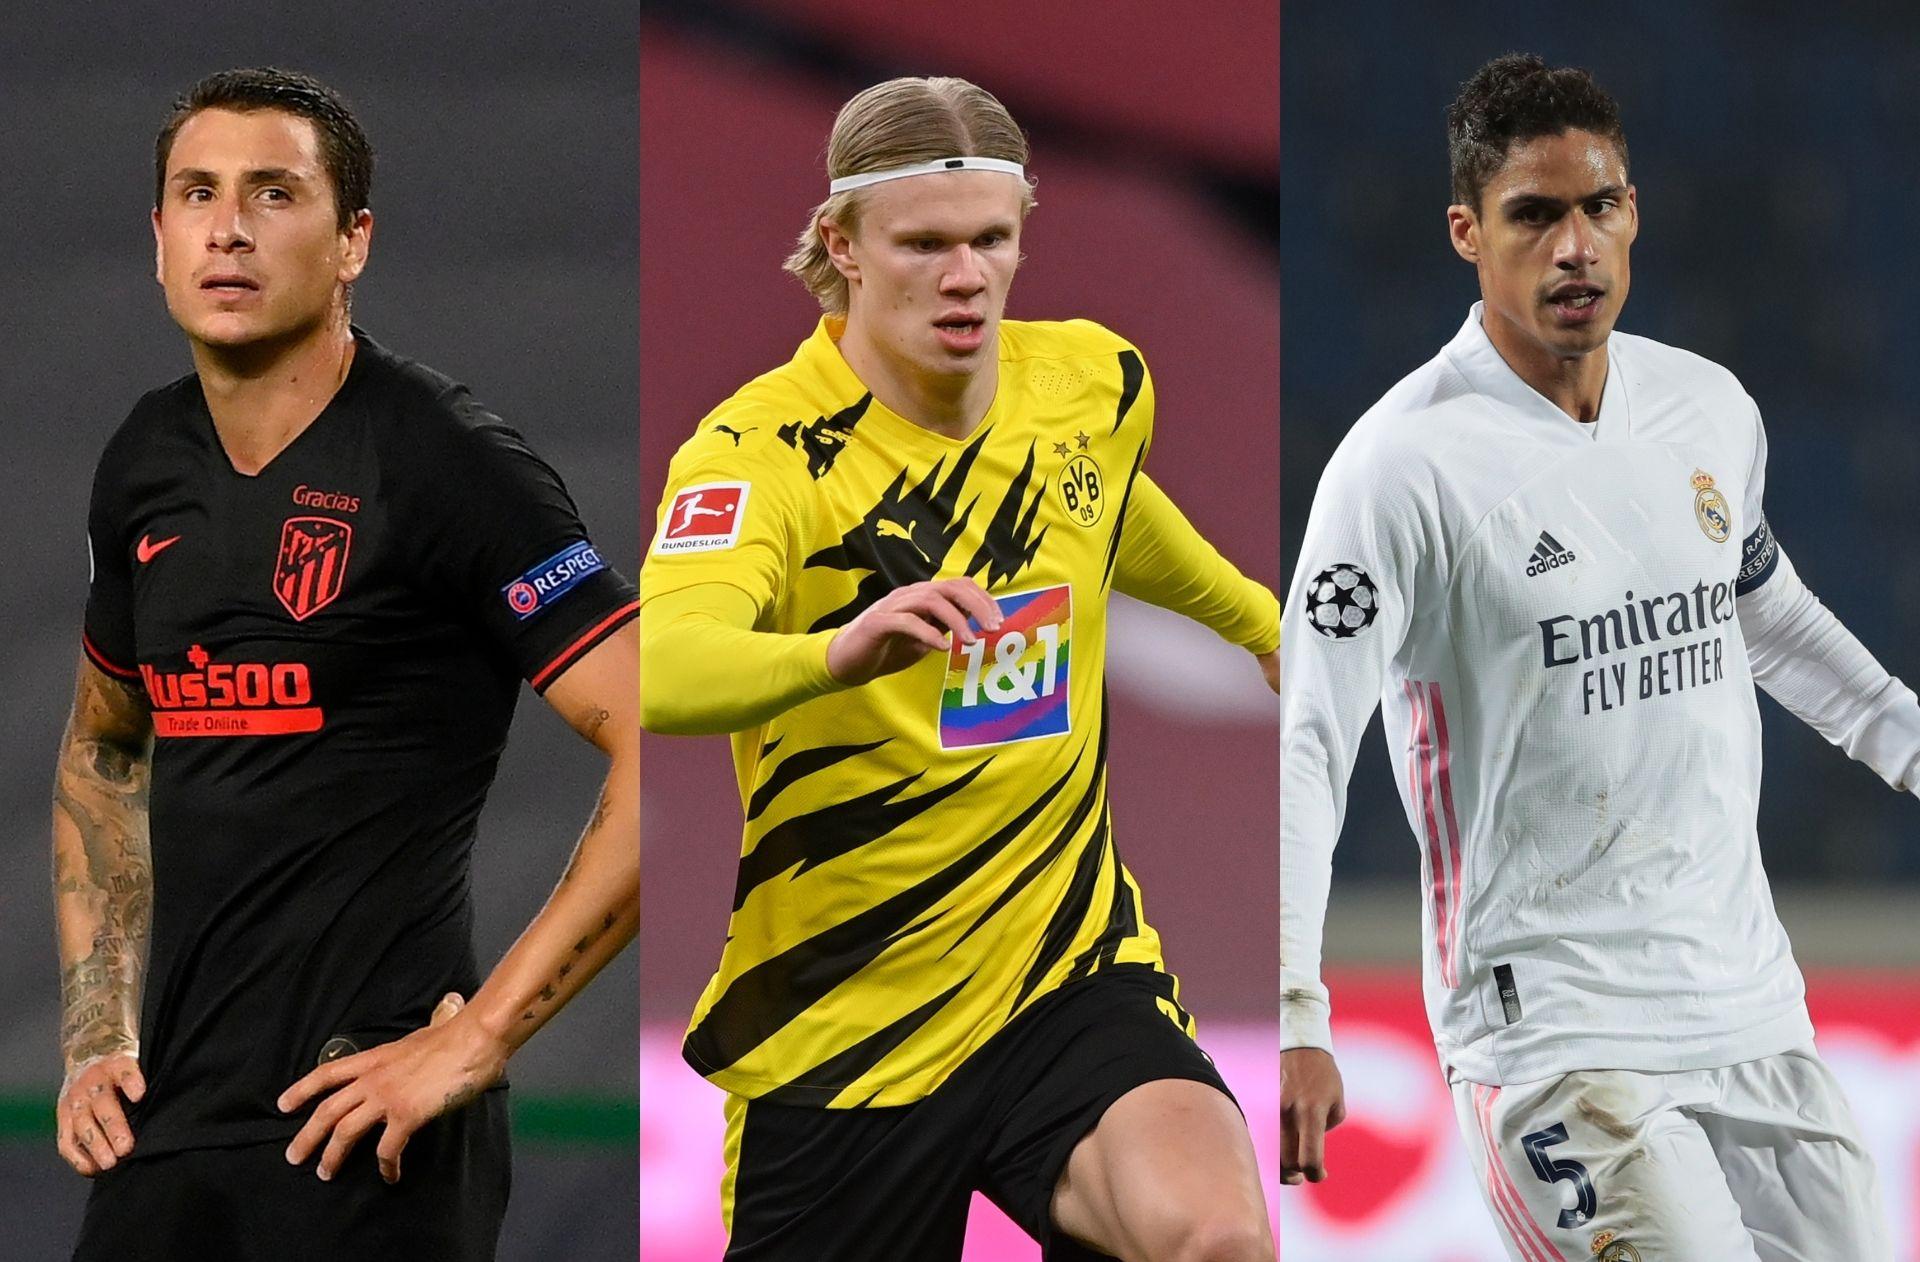 Jose Gimenez of Atletico Madrid, Erling Haaland of Borussia Dortmund, Raphael Varane of Real Madrid